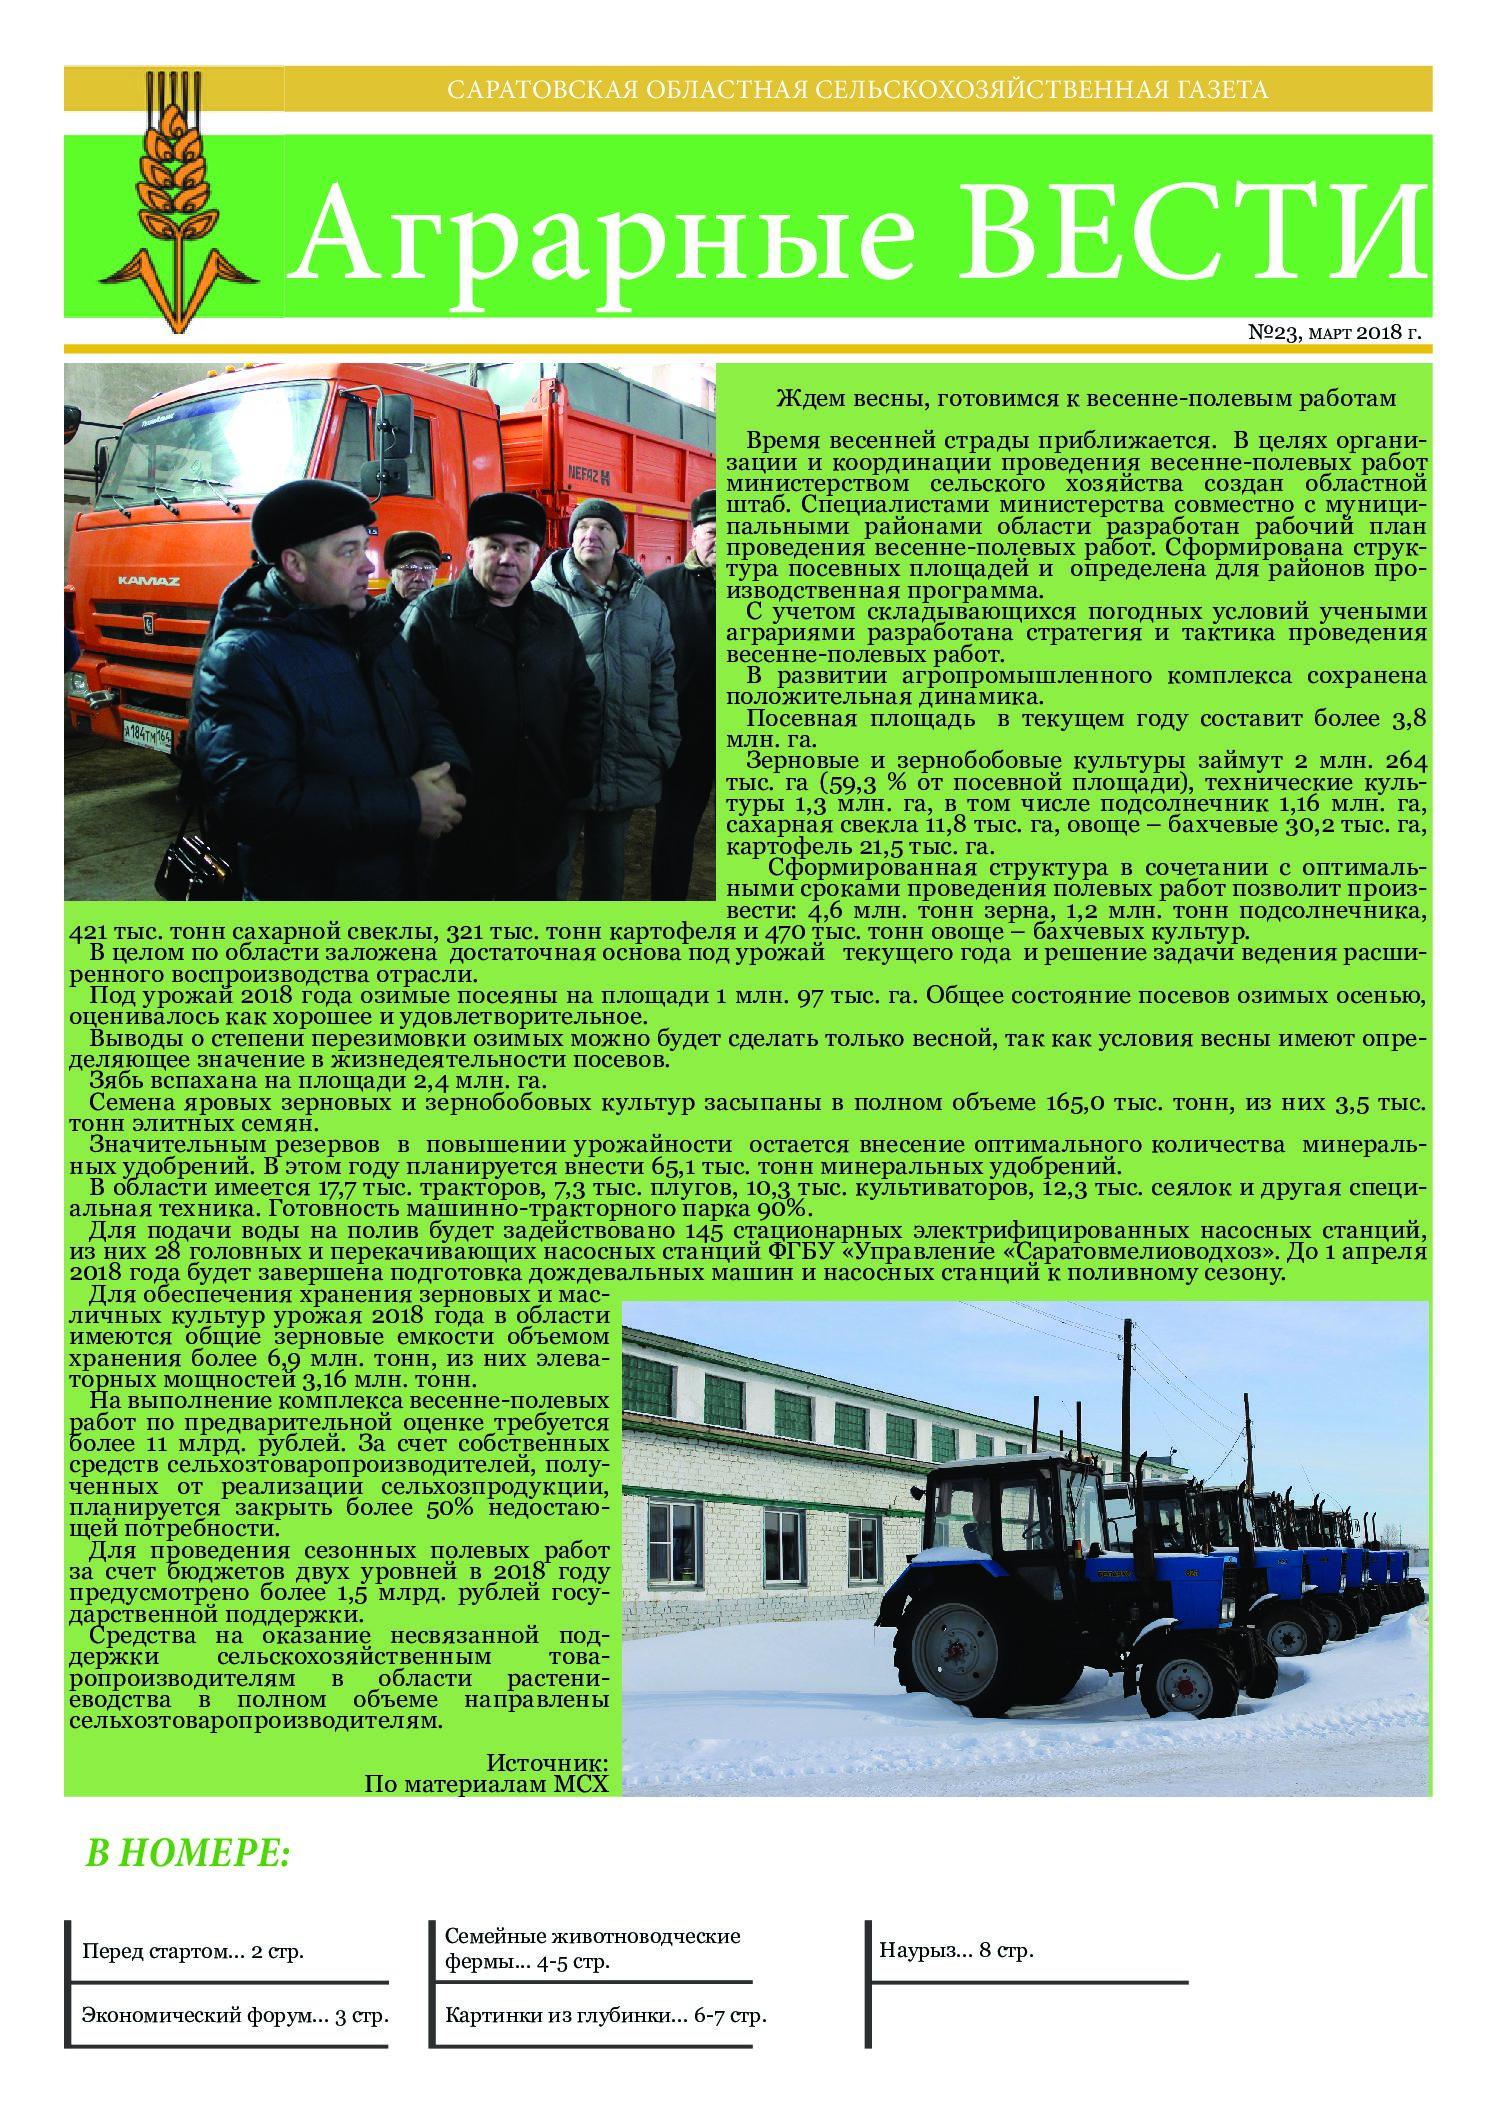 https://saratovagro.ru/wp-content/uploads/2020/08/2.2018-pdf.jpg